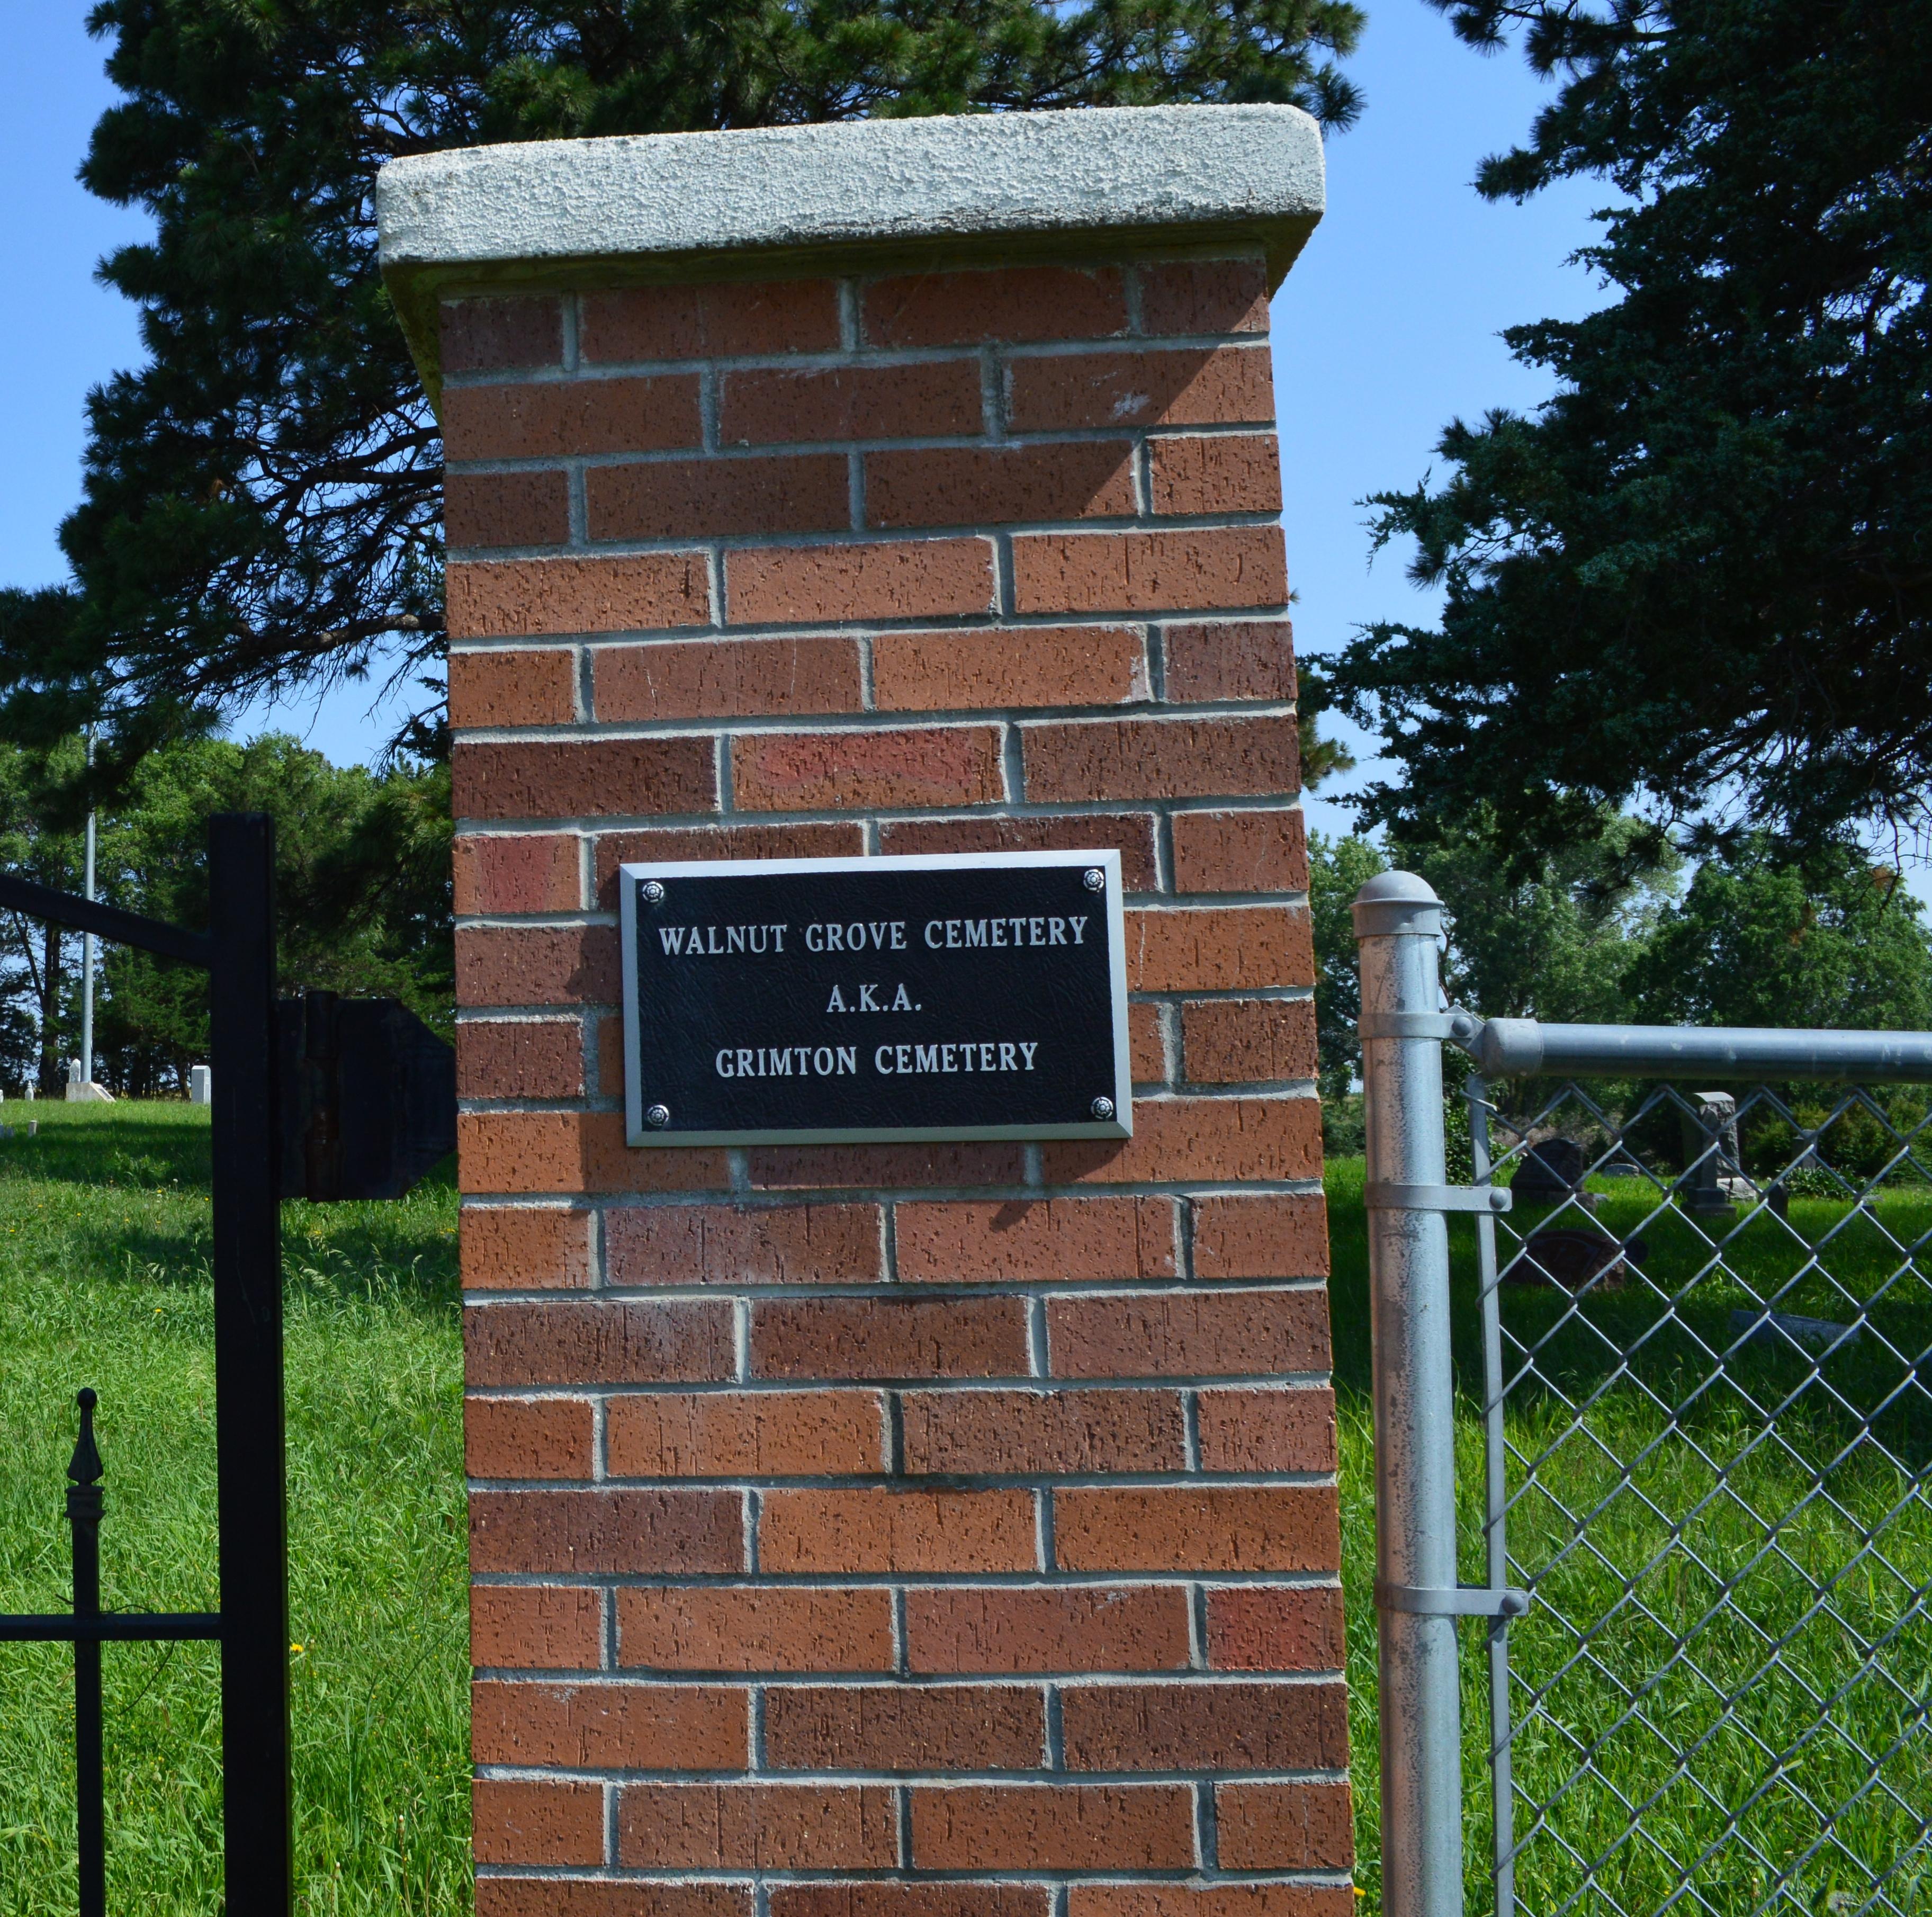 Grimton Cemetery